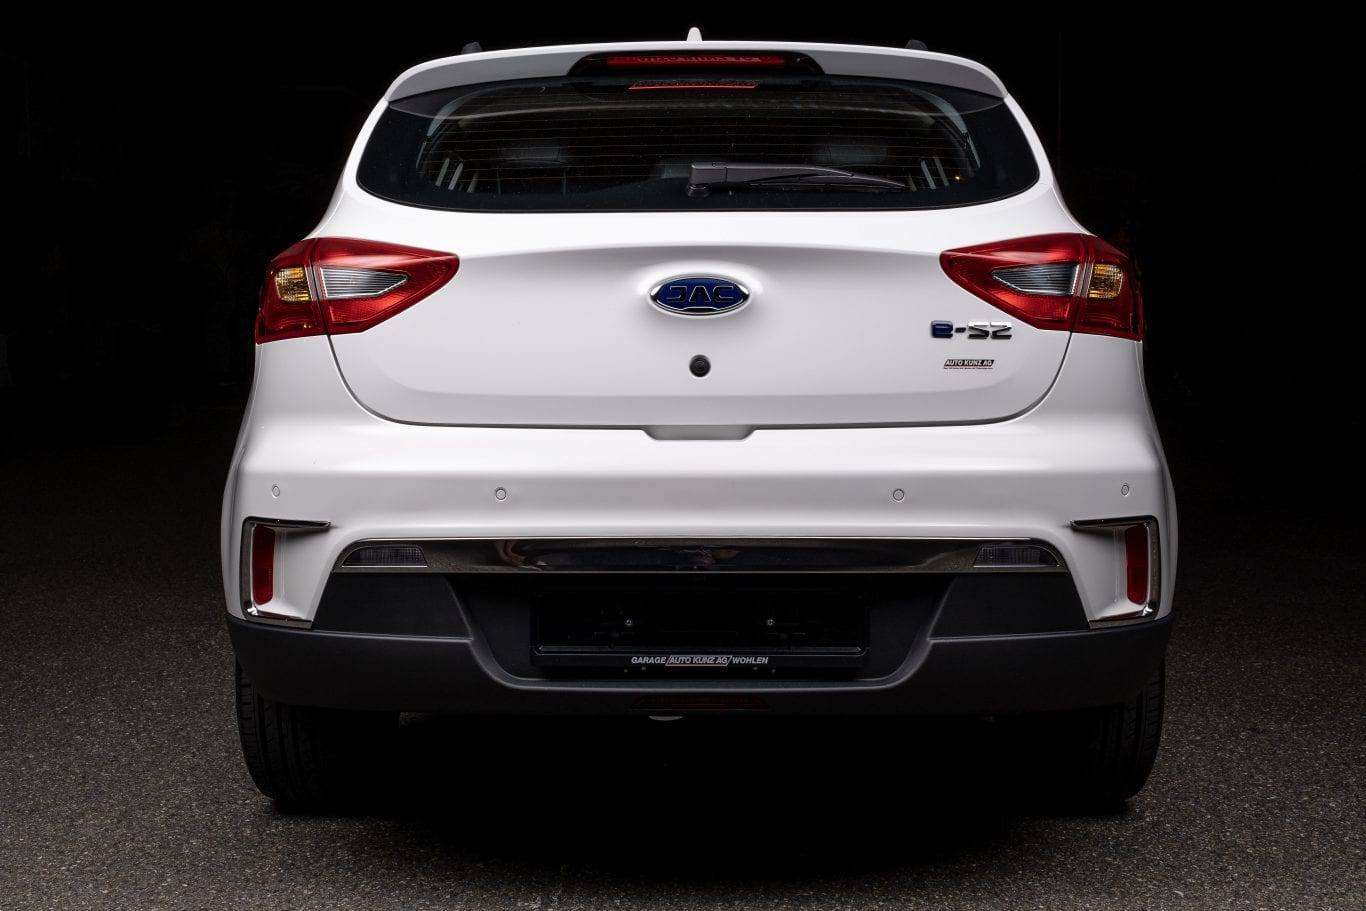 JAC – Auto Kunz ist offiziell neuer Generalimporteur - Auto Kunz AG 2